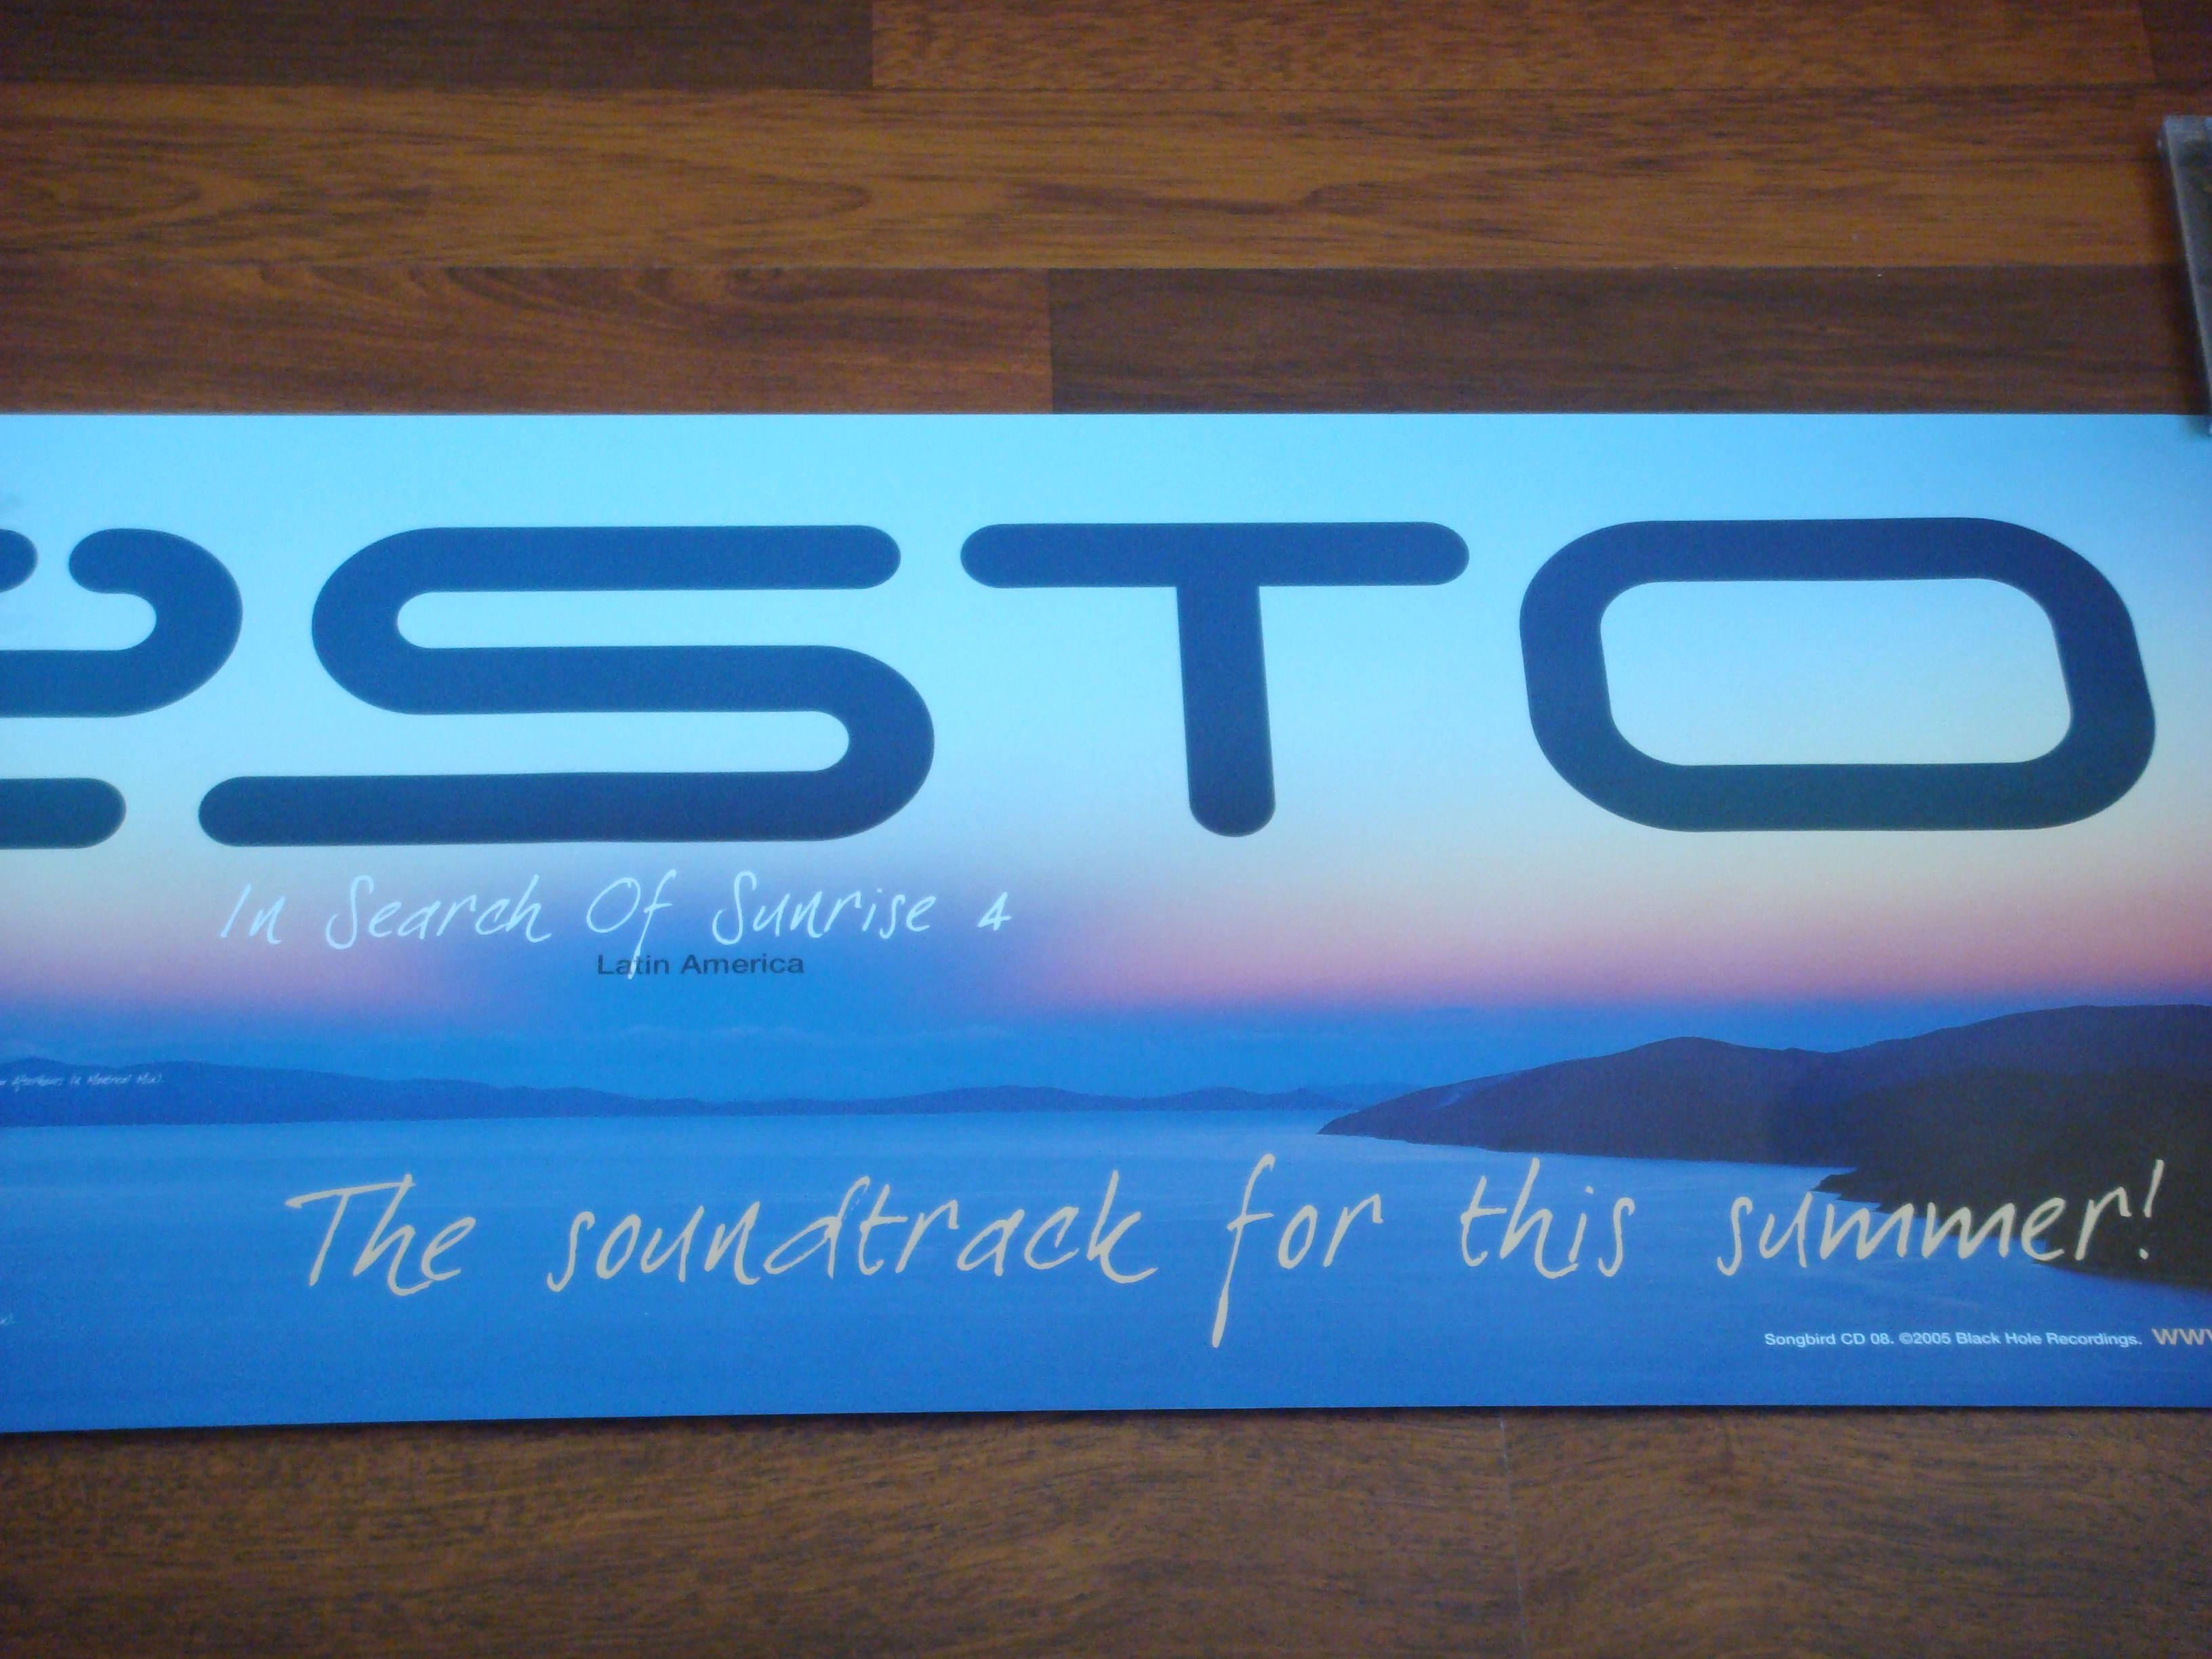 Dj Tiesto In Search Of Sunrise 4 Release Poster